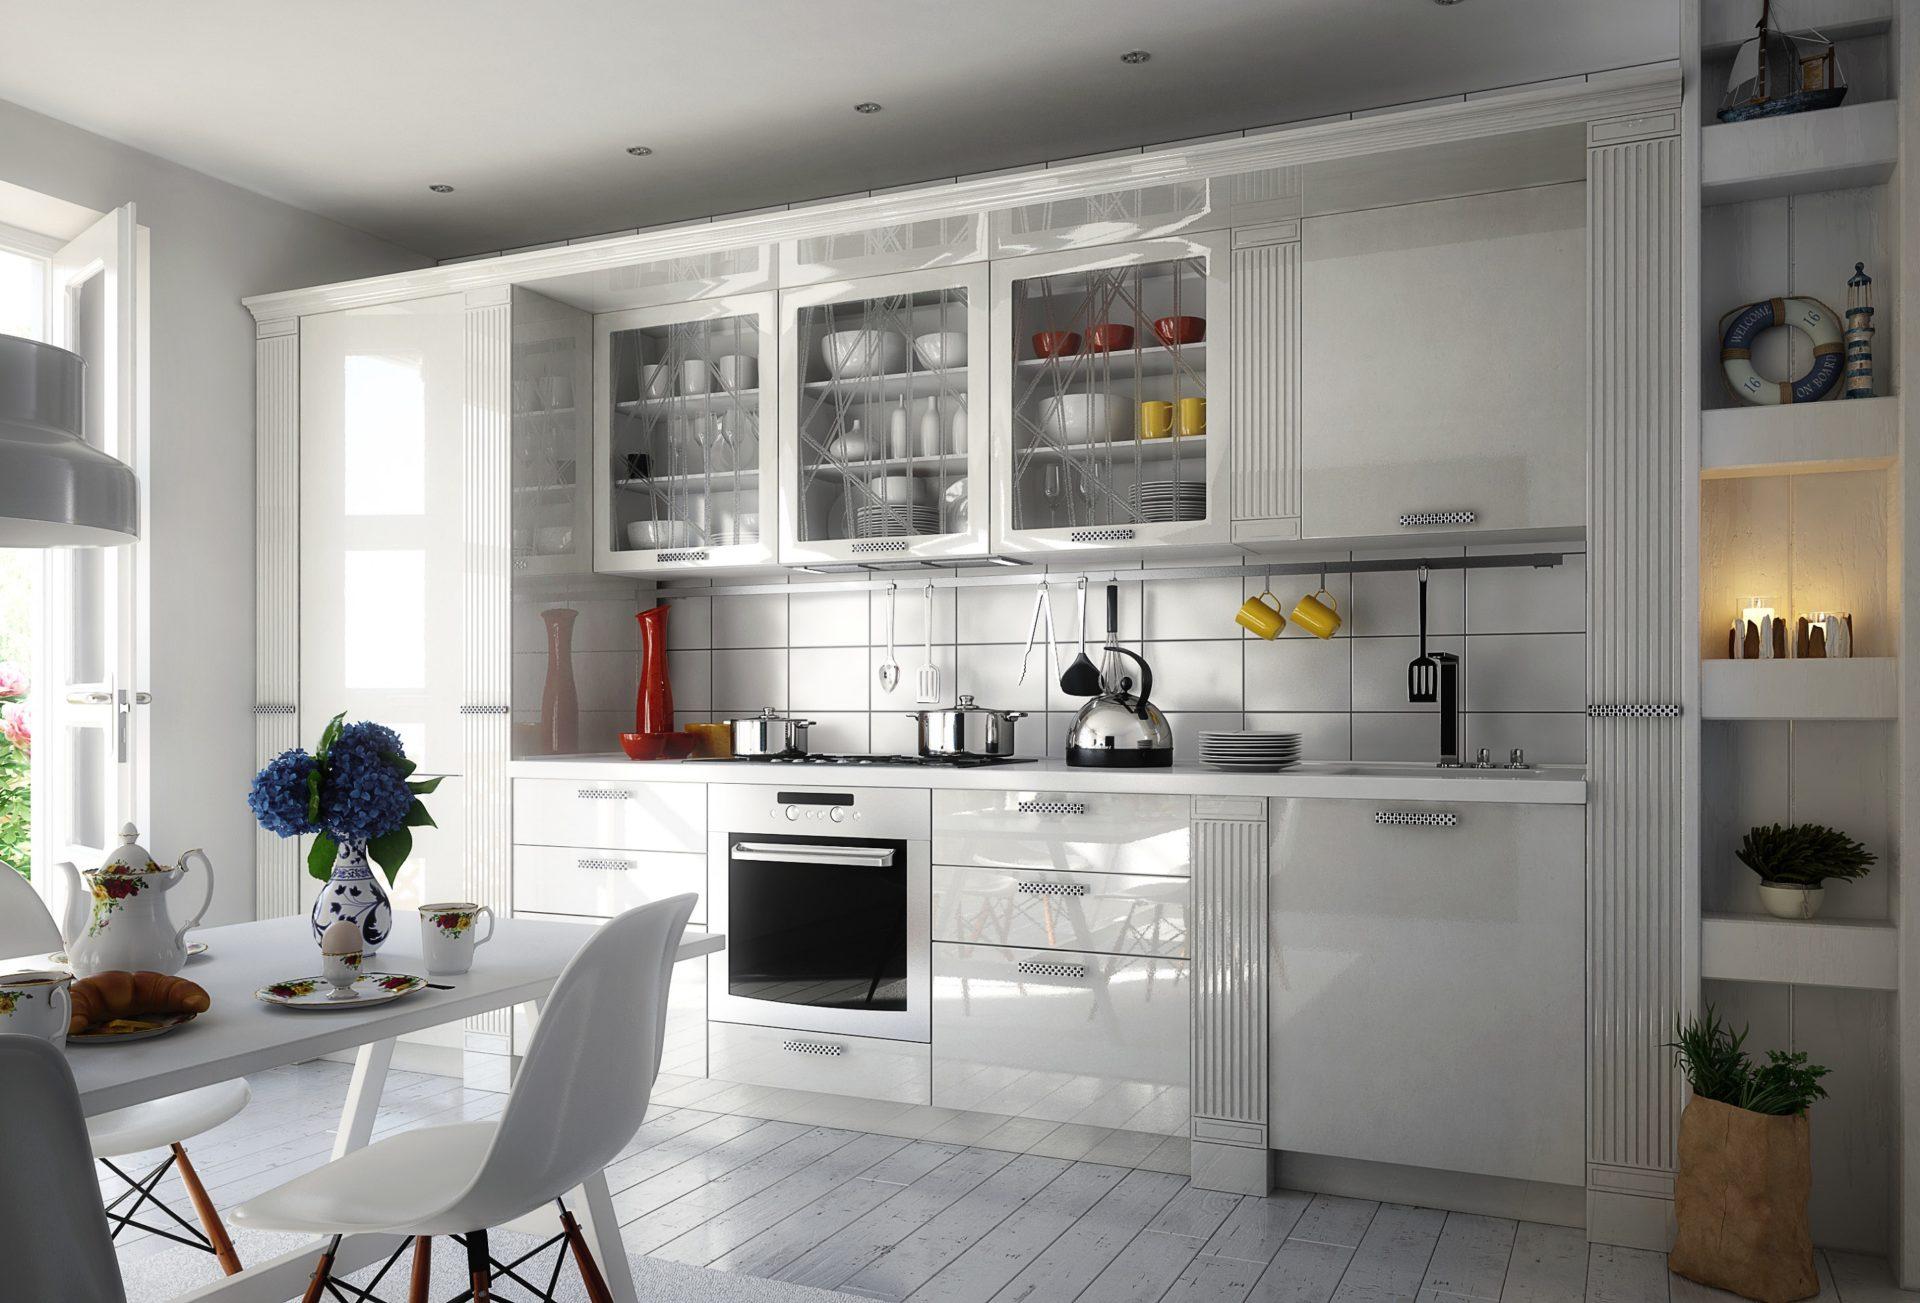 Белая кухня в стиле неоклассика VIVA под заказ в &КУХНИ